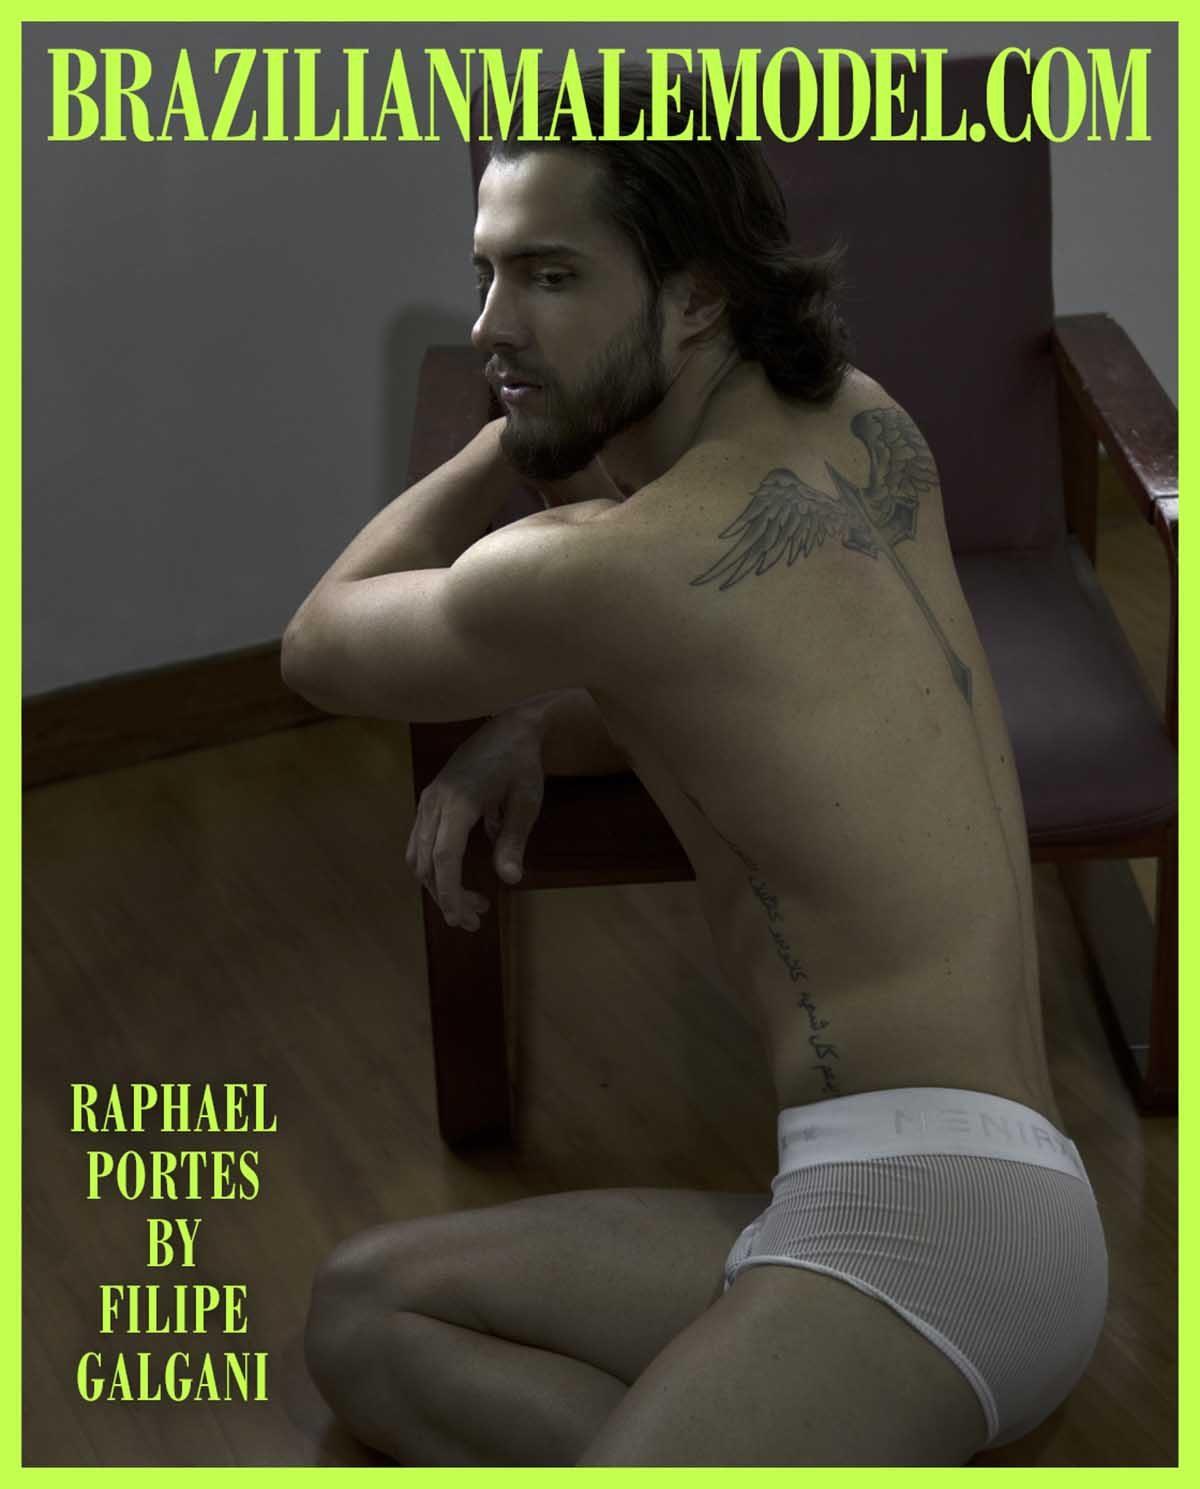 Raphael Portes by Filipe Galgani